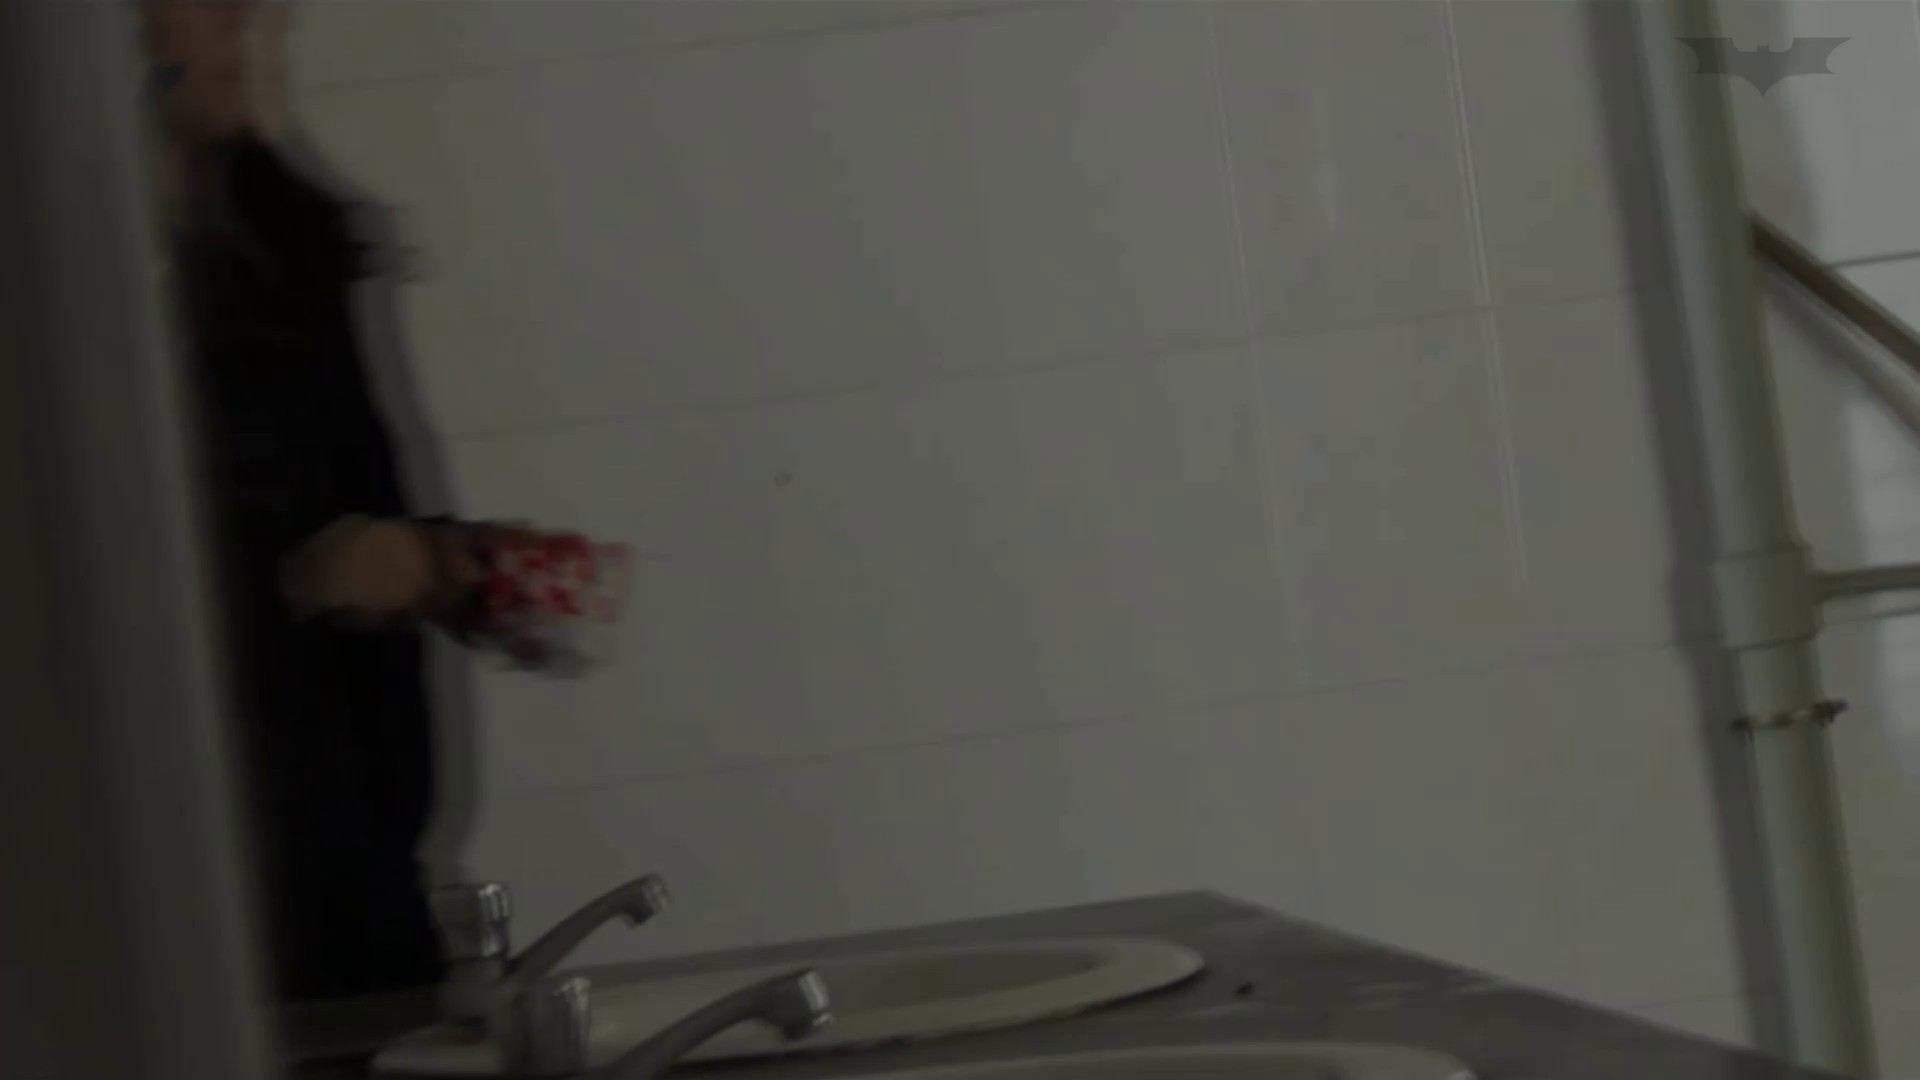 JD盗撮 美女の洗面所の秘密 Vol.46 盗撮で悶絶 おまんこ無修正動画無料 99画像 6